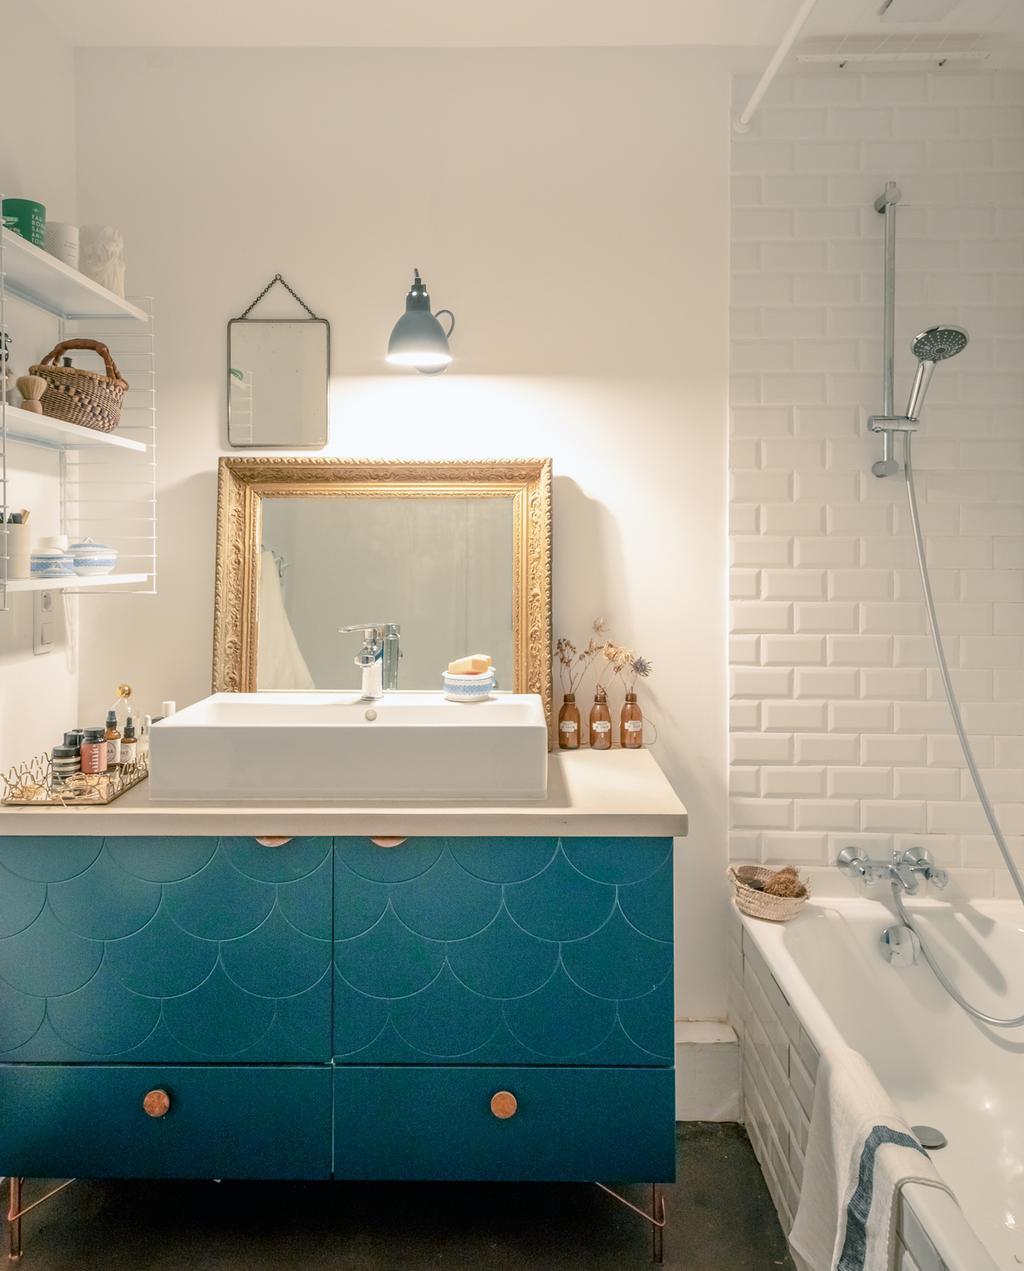 vtwonen 2-2020 | badkamer blauw kastje